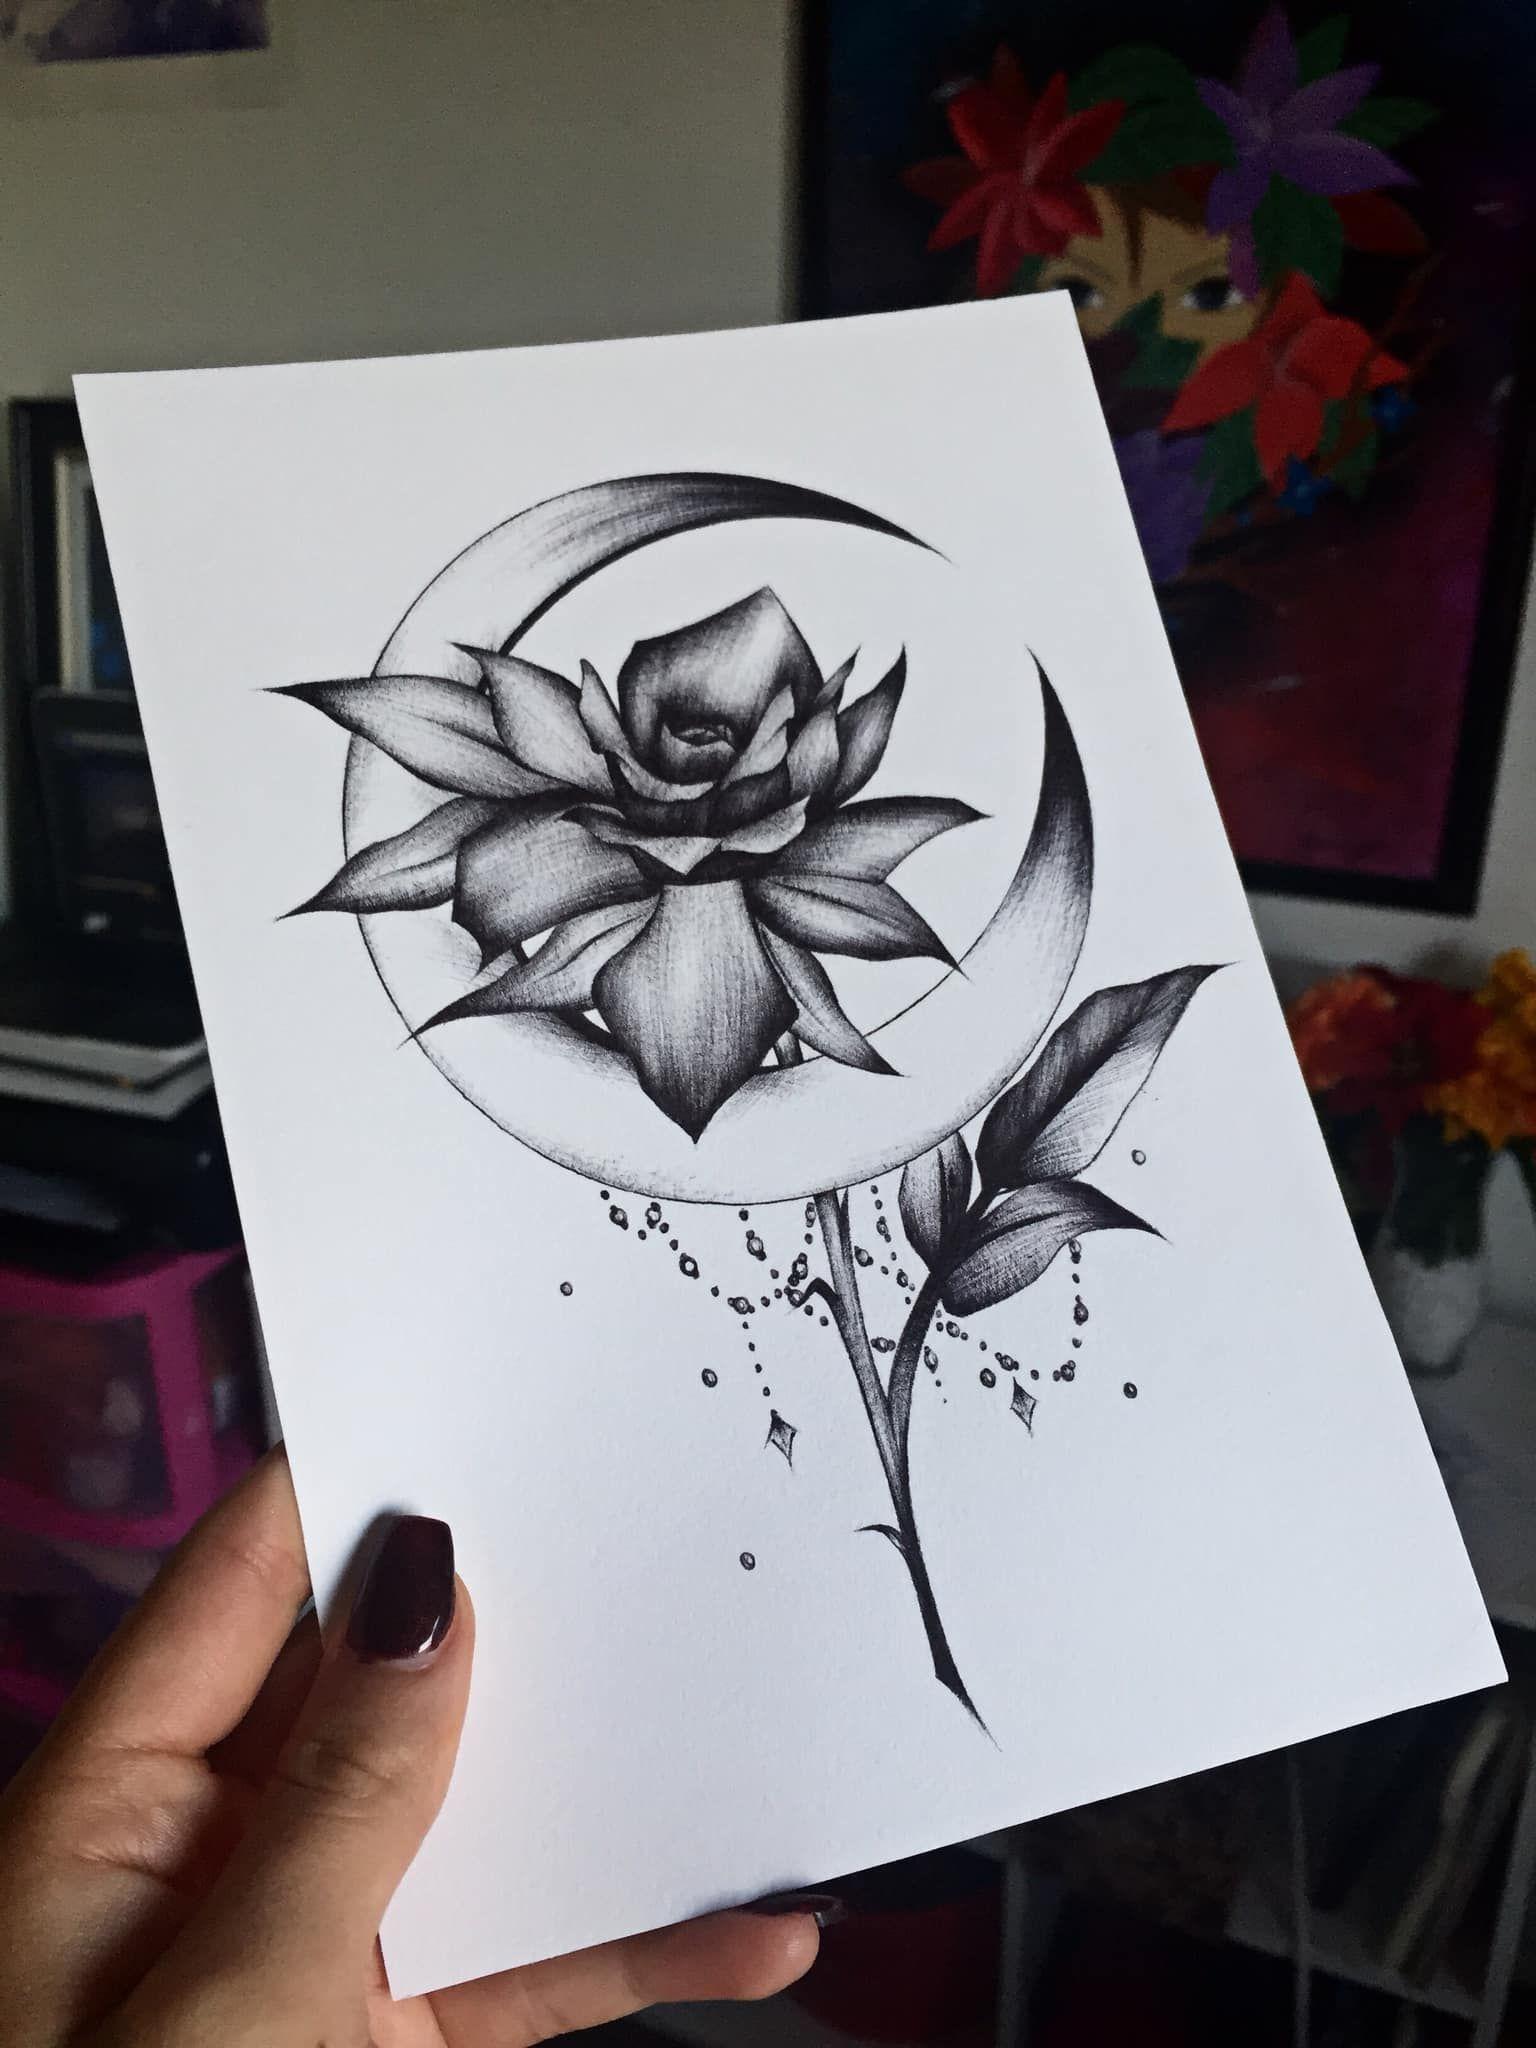 Pin De Esther Sanchez En Dibujos Tatuajes Inspiradores Dibujos